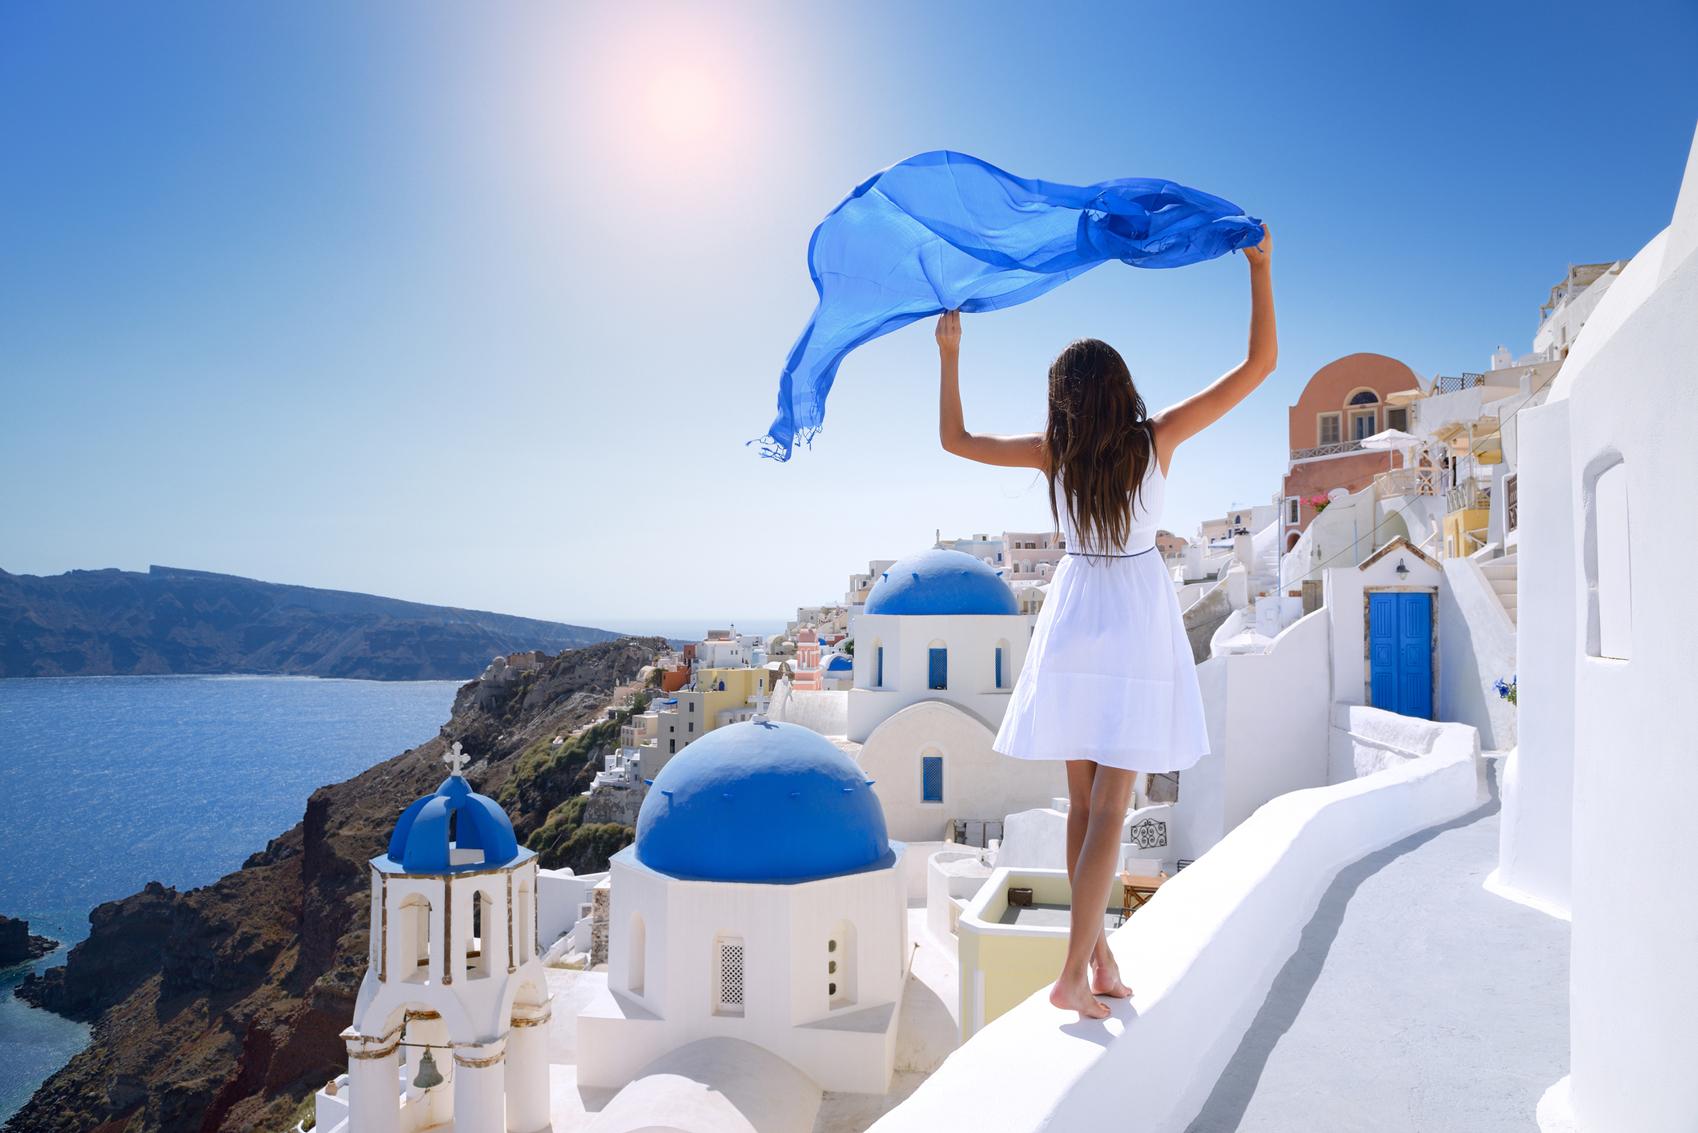 Solo travel destinations Beauty-of-Santorini-www.istockphoto.comgbphotobeauty-of-santorini-gm483749783-27379262-4FR